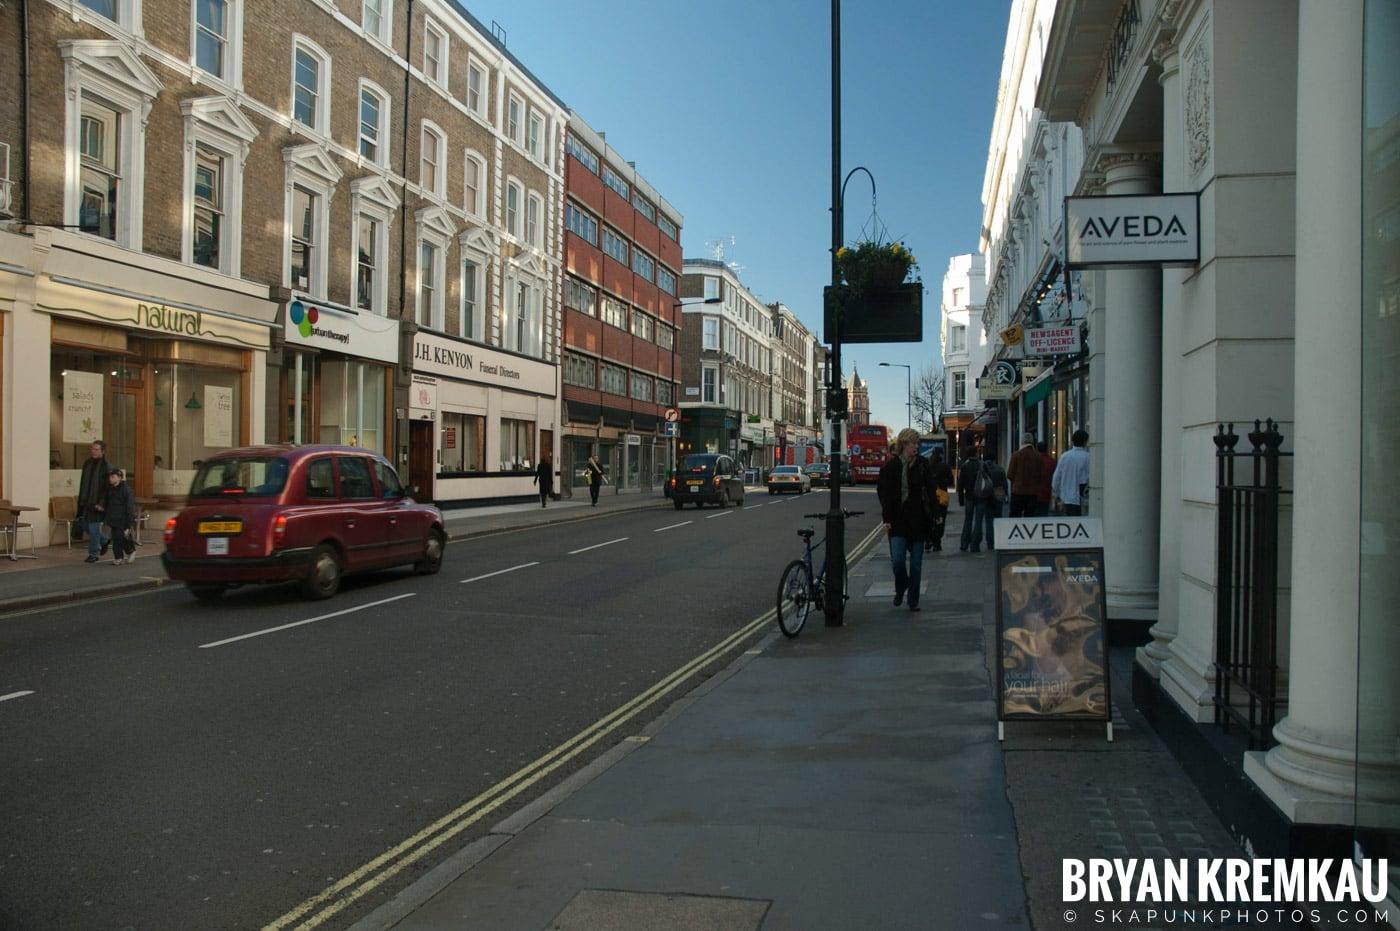 London, England - Day 2 - 12.9.06 (28)